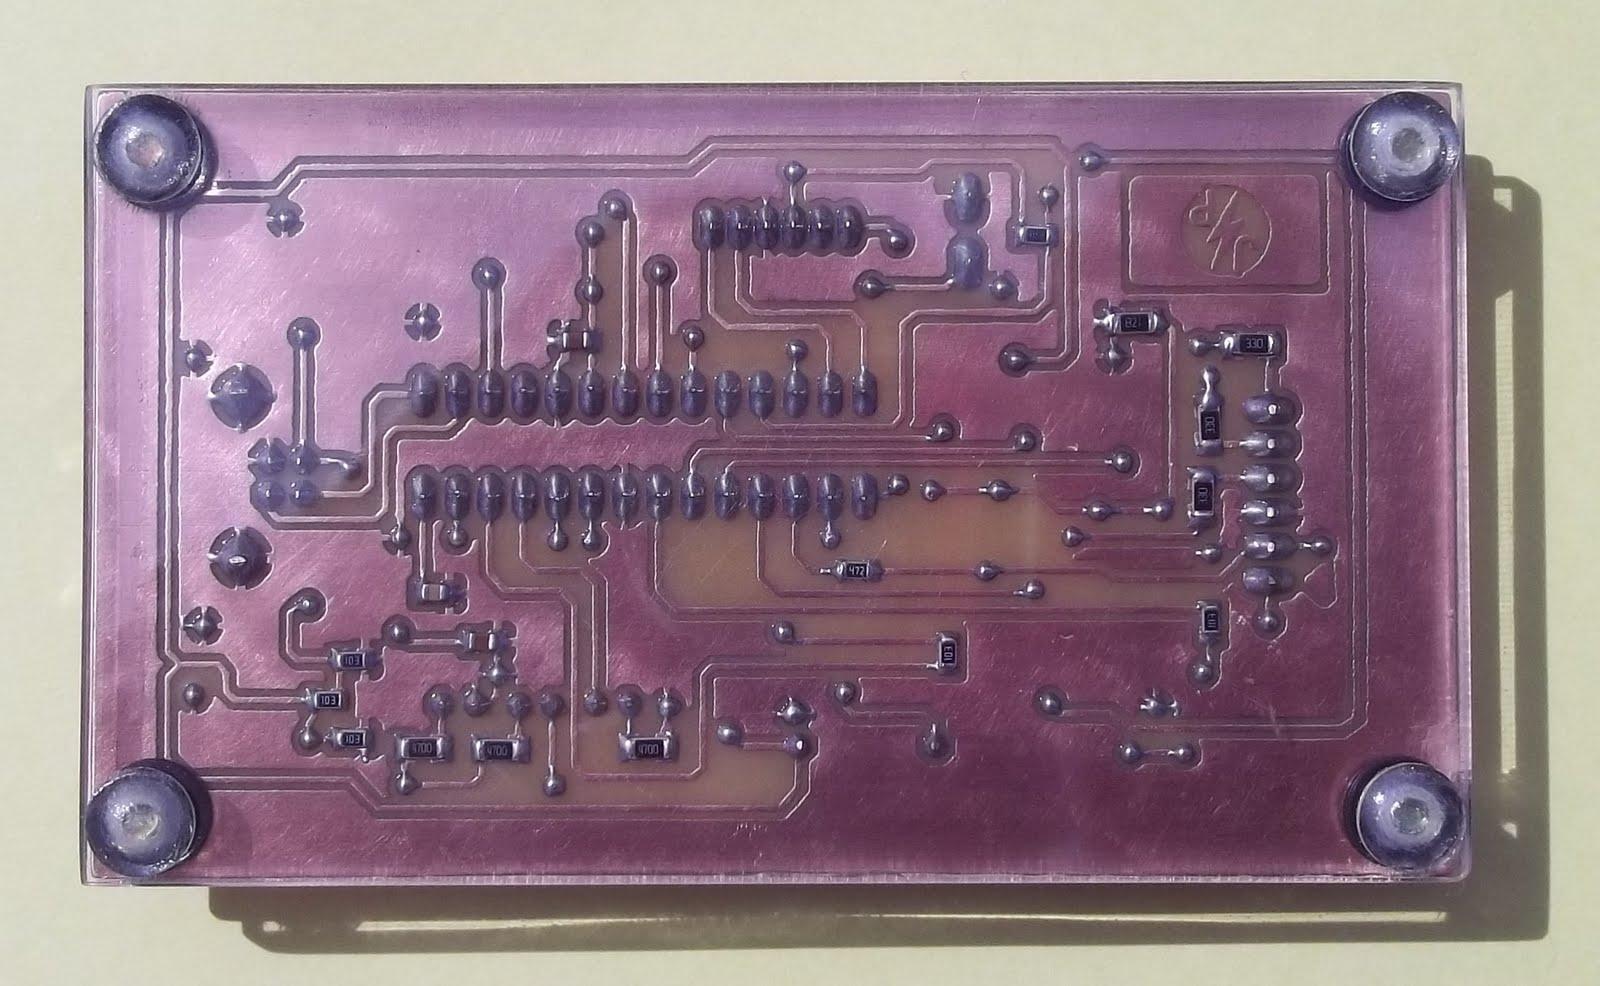 Eletricamente Falando Pickit2 Original Pickit 2 Microcontroller Programmer Se